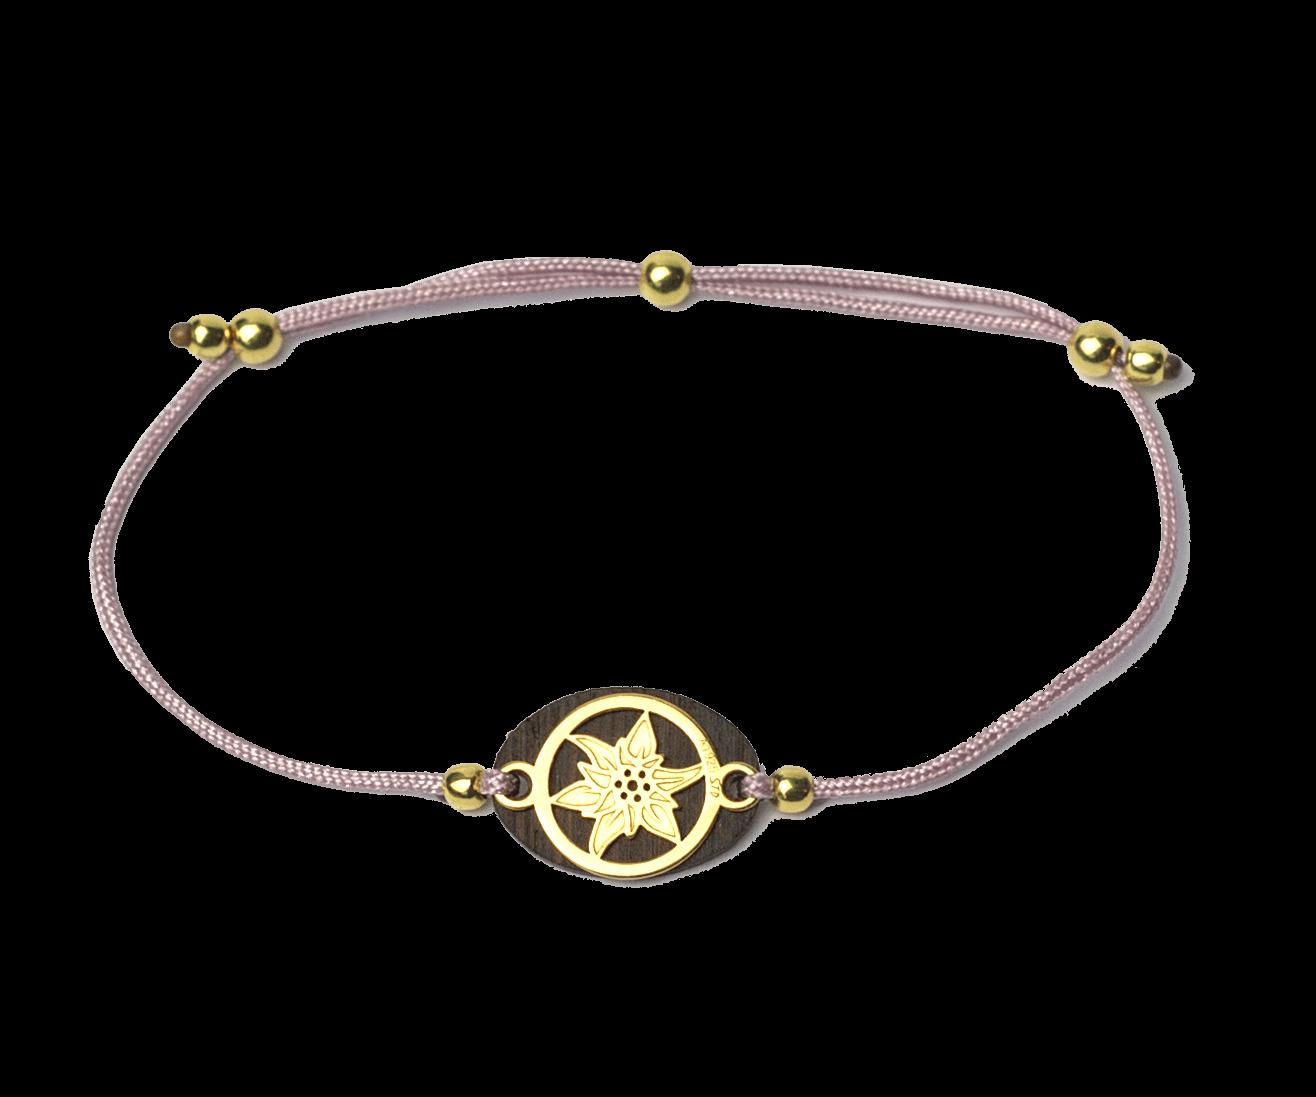 Armband-Produkt-Gold-flieder-edelweiß